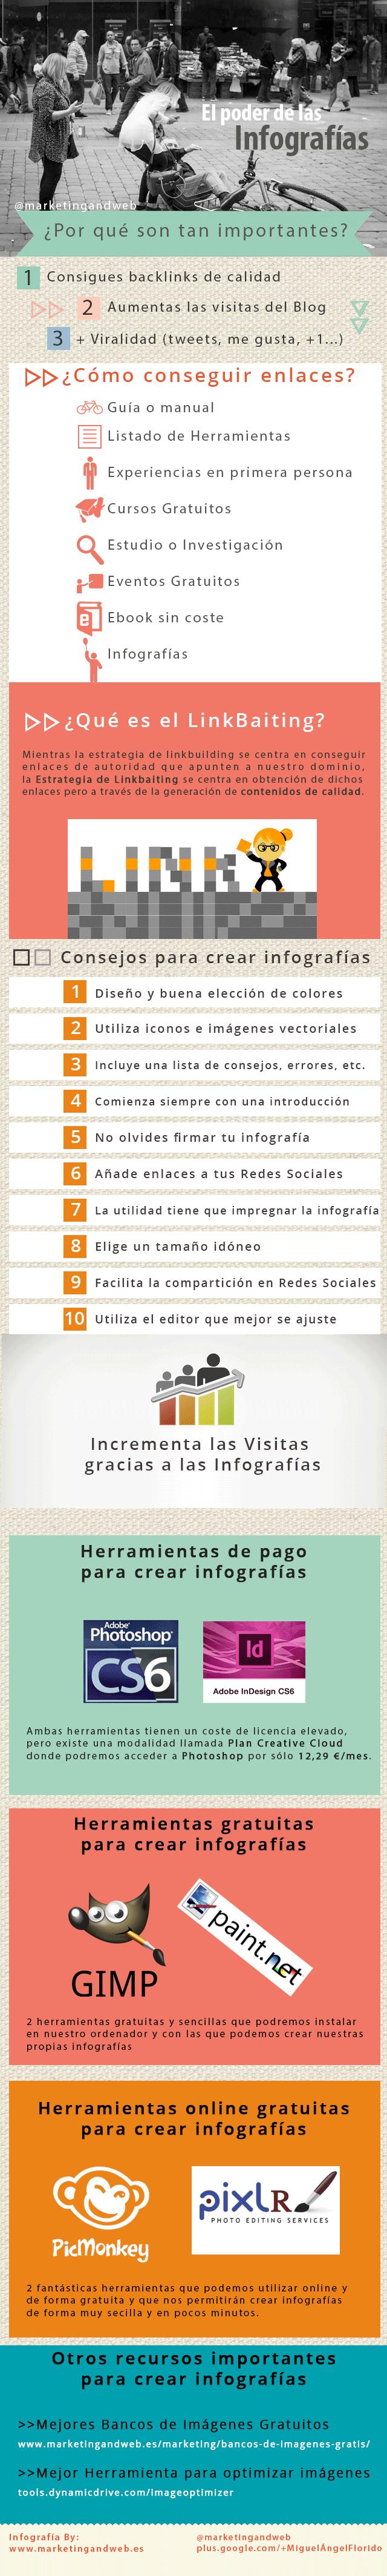 Infografia - Infografías; Mejora el SEO con tu estrategia de Linkbaiting